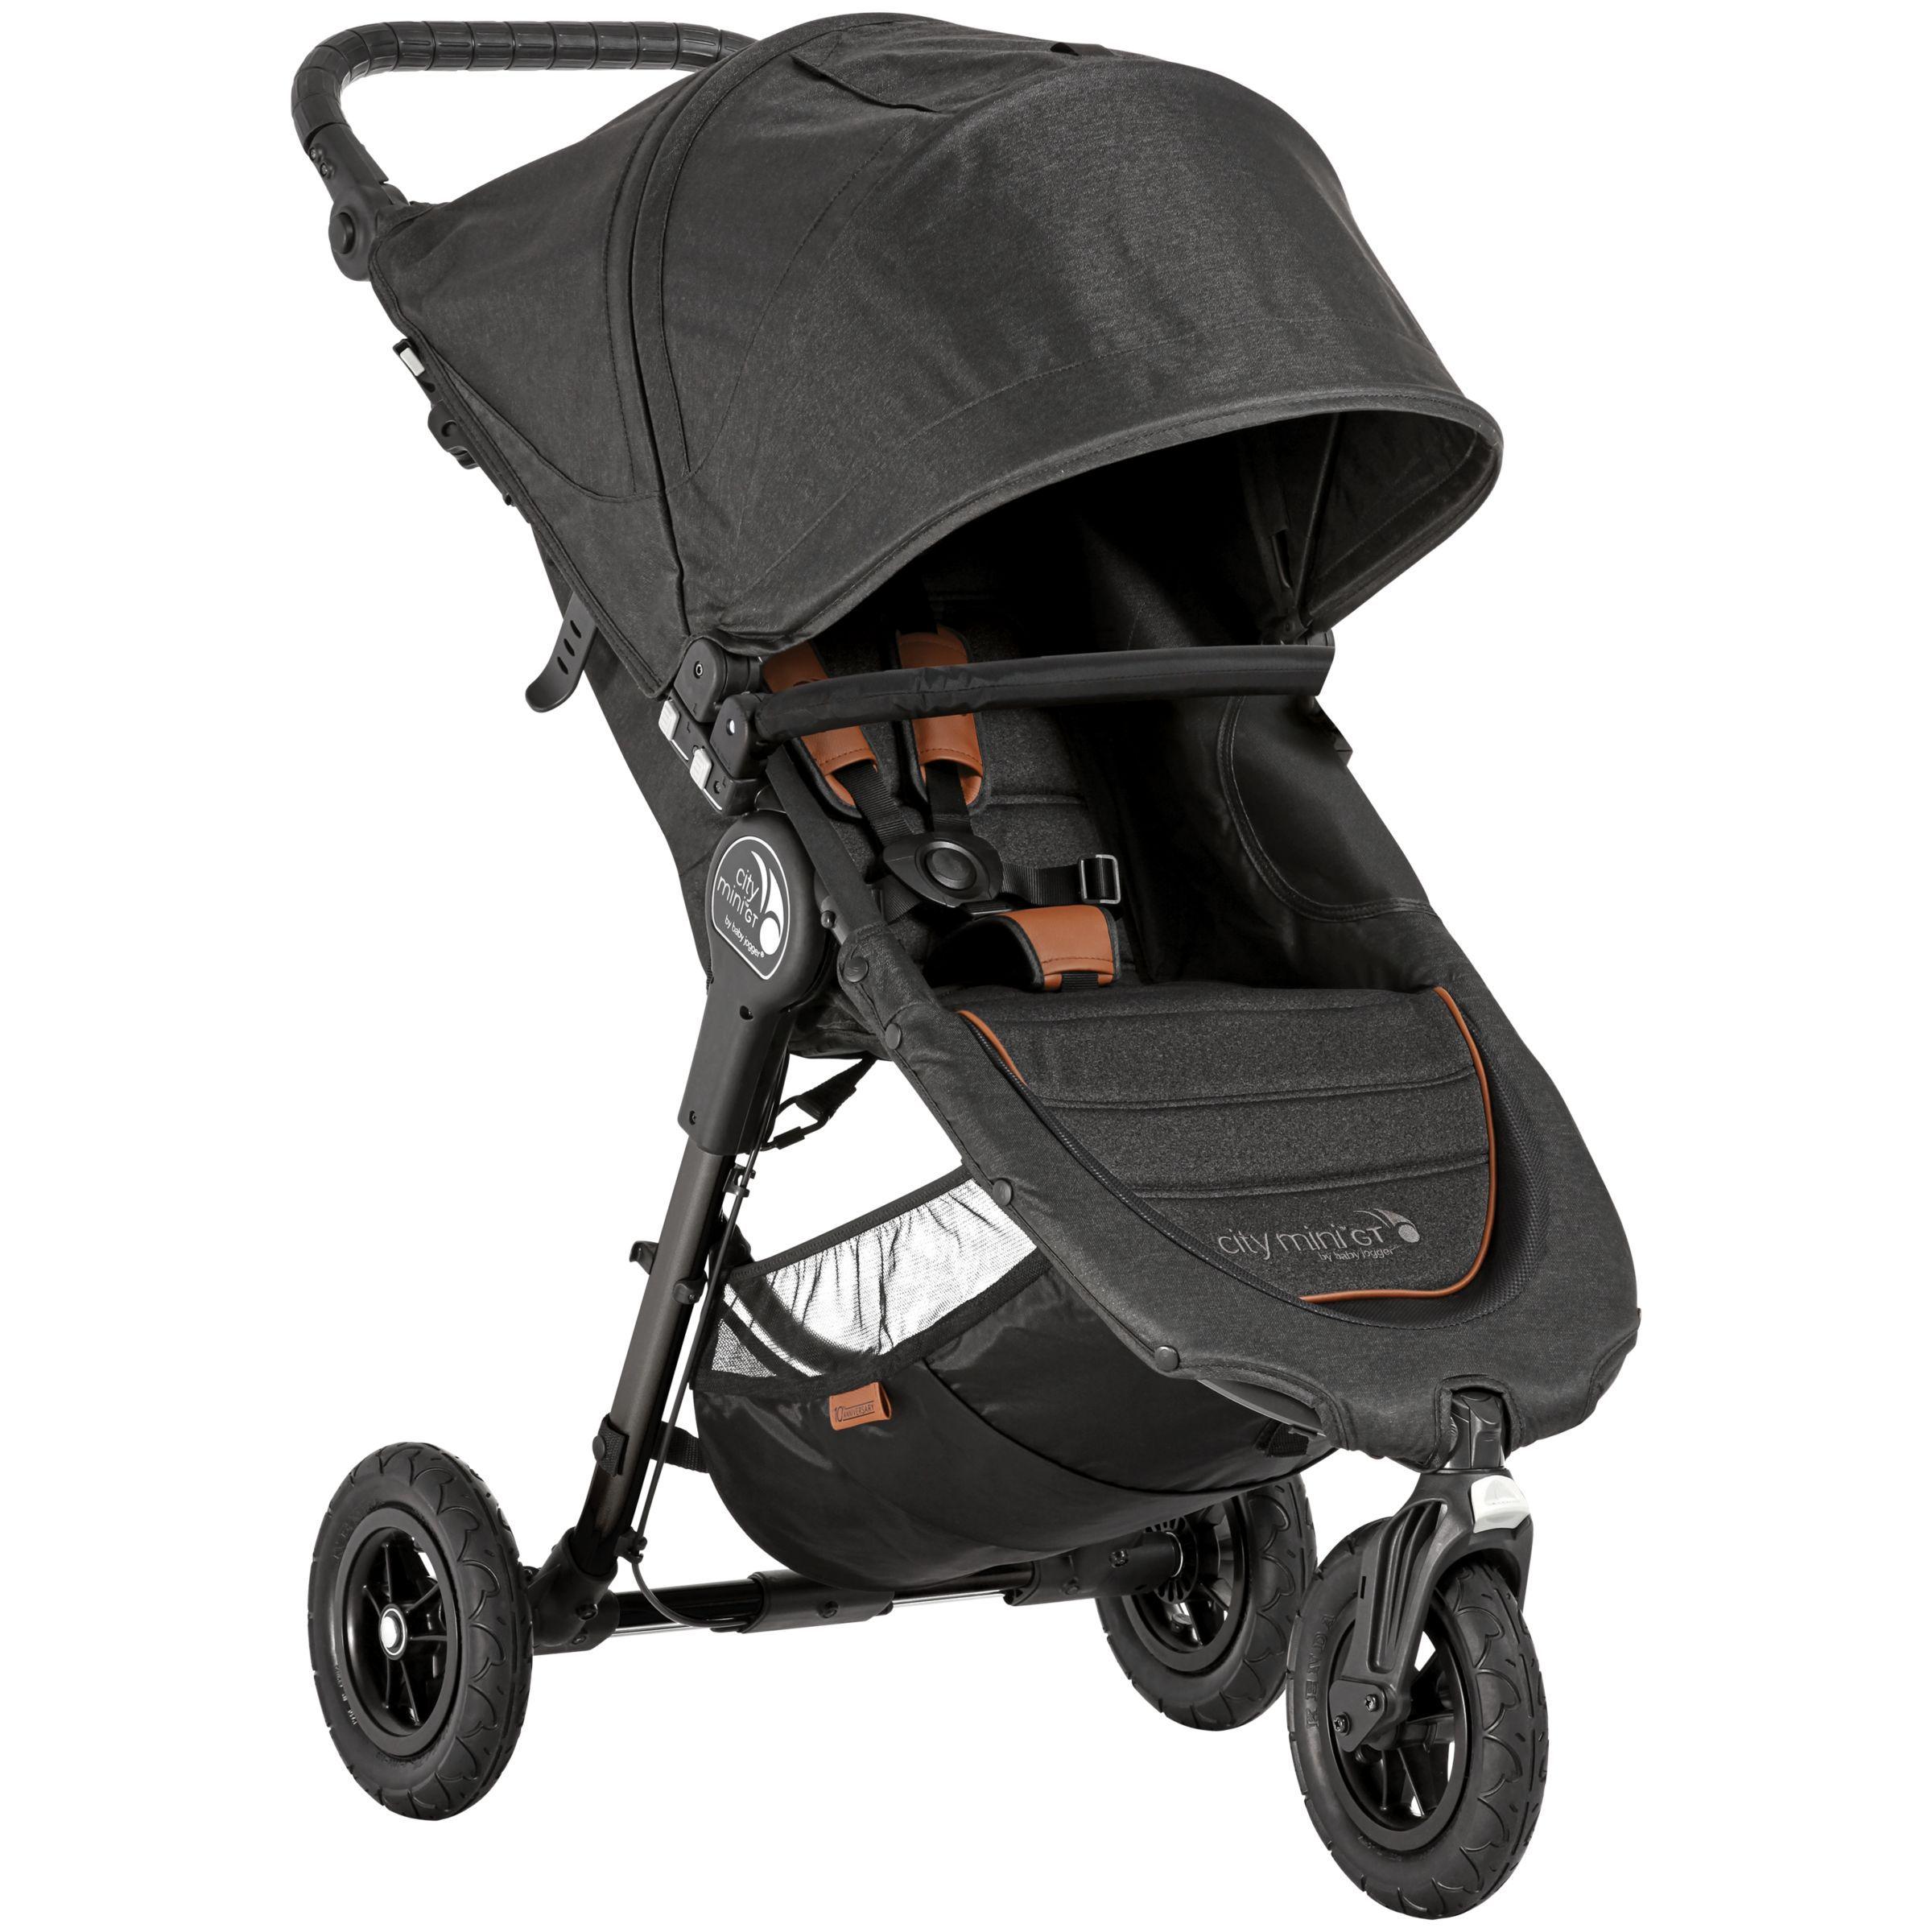 Baby Jogger City Mini GT 10th Anniversary Edition